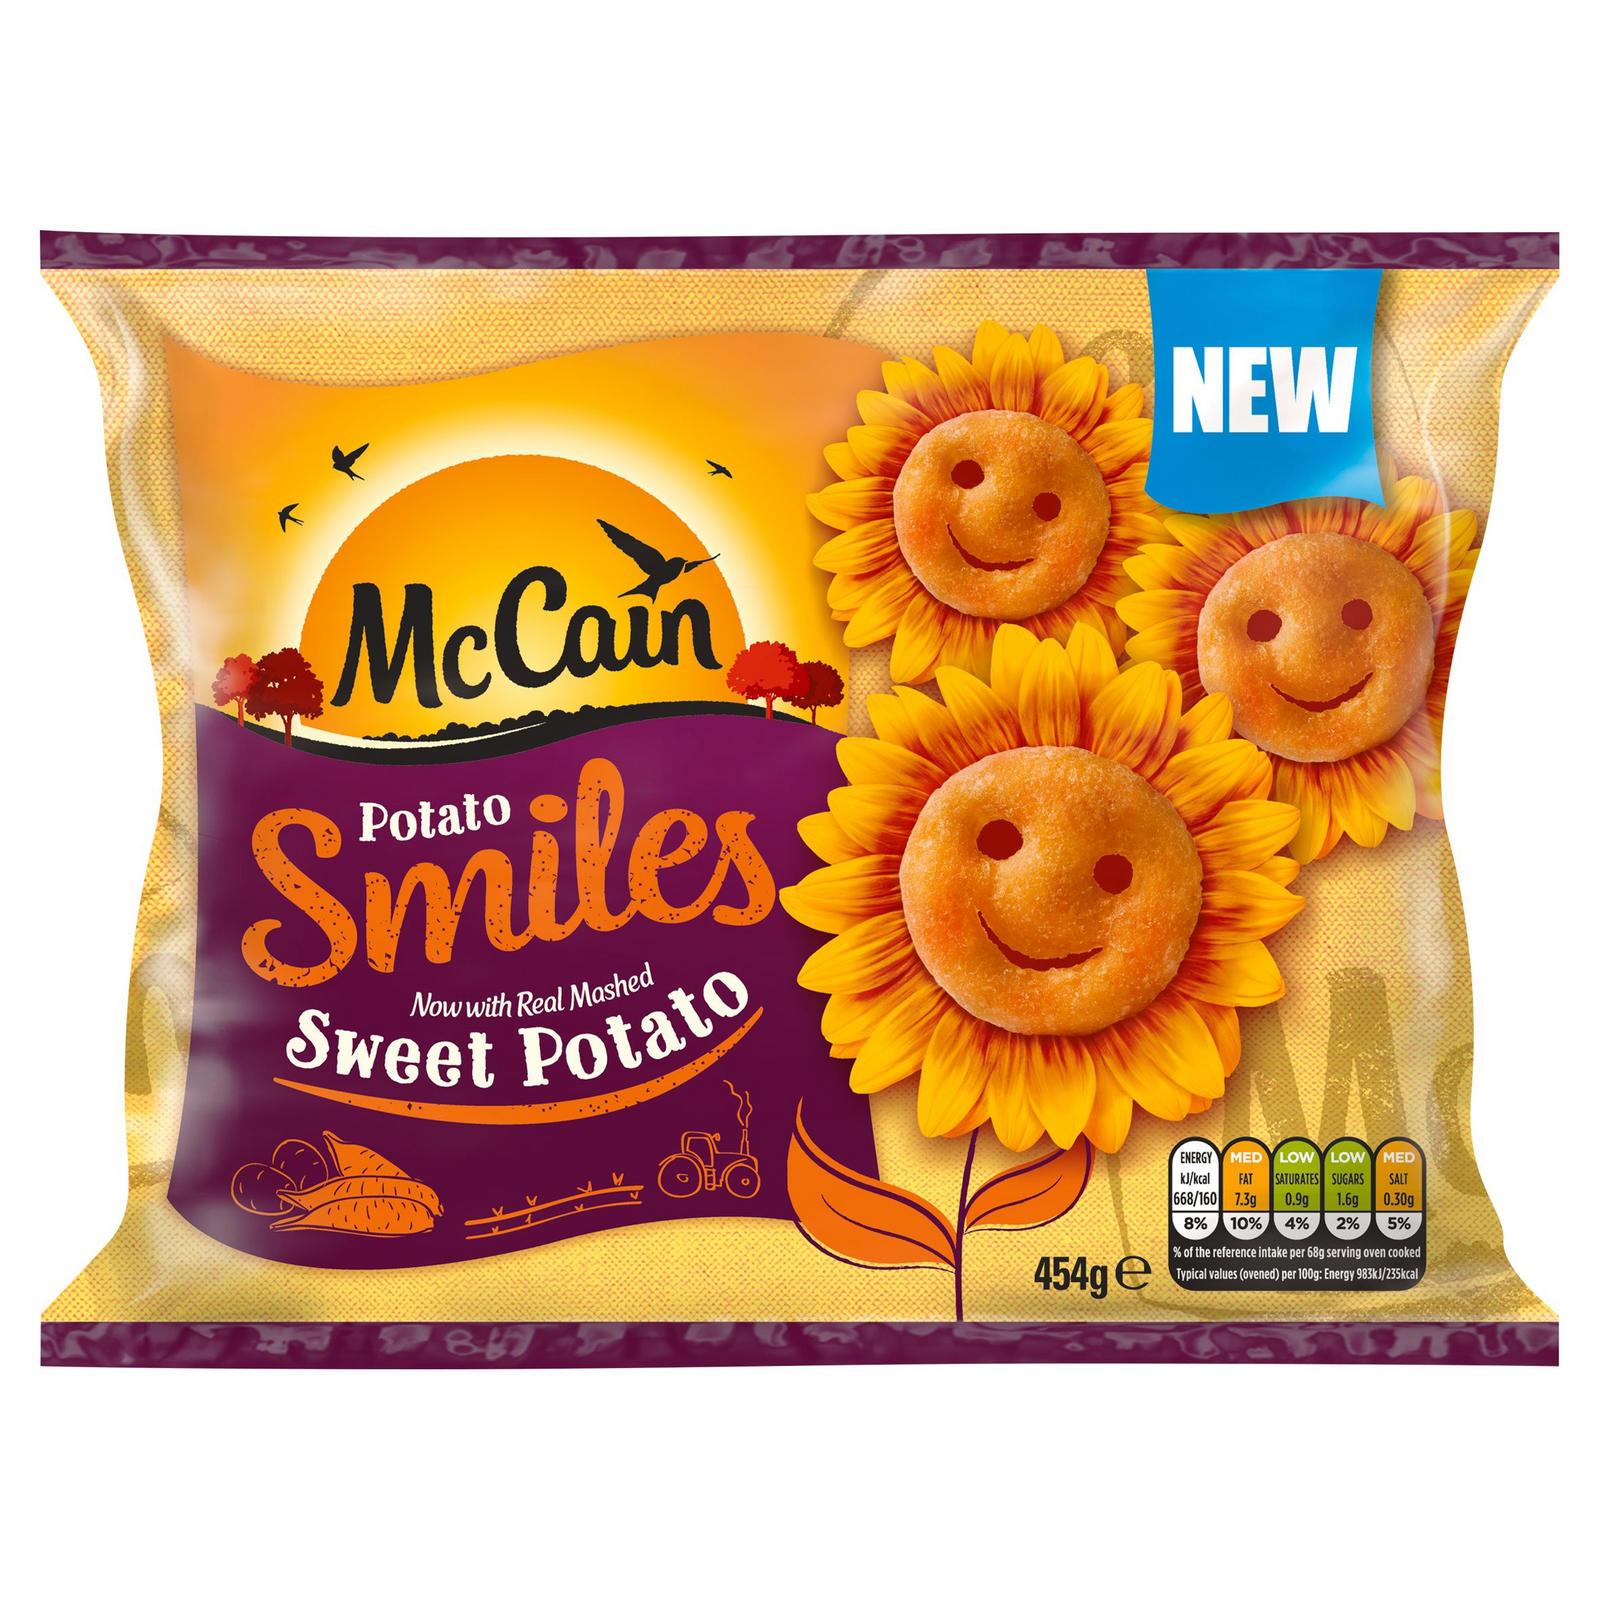 Mccain Sweet Potato Smiles 454g Potatoes Iceland Foods